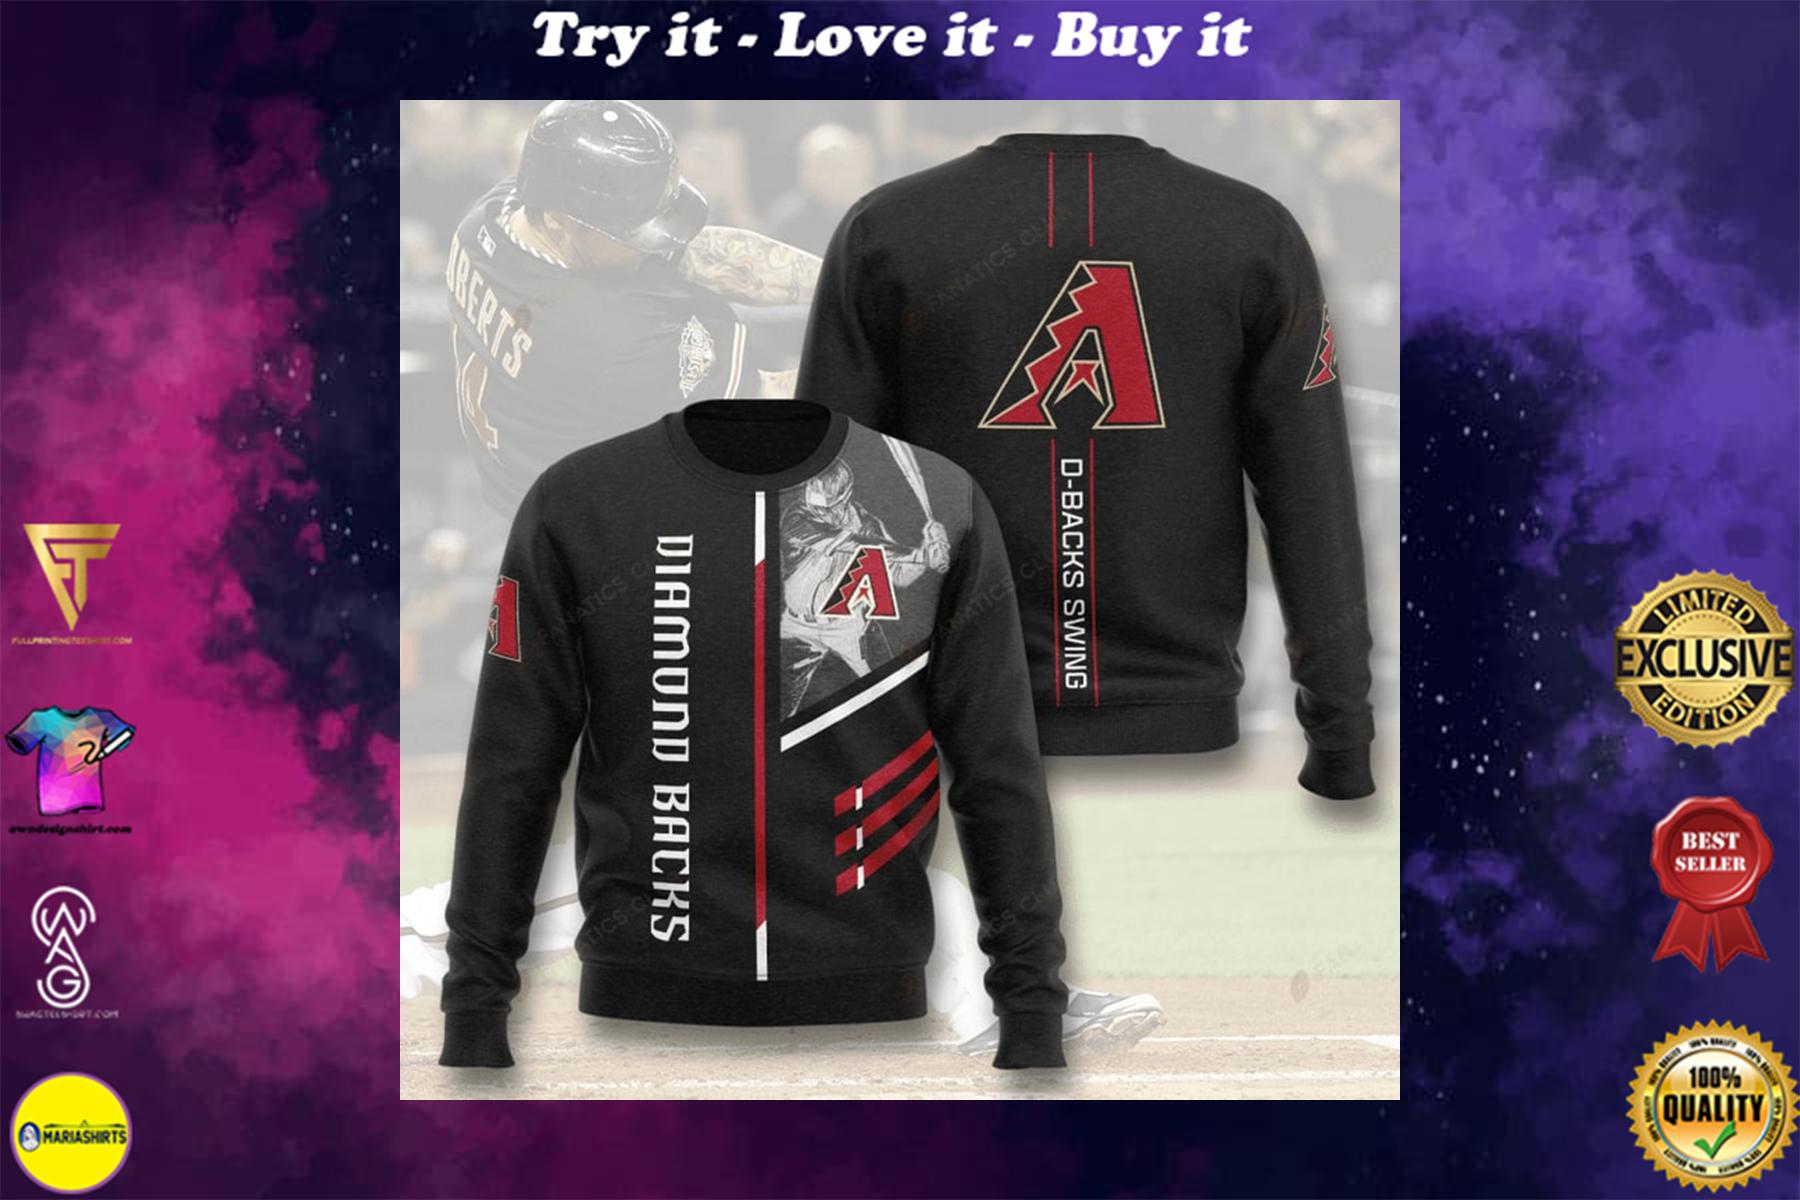 [special edition] arizona diamondbacks d-backs swing full printing ugly sweater - maria